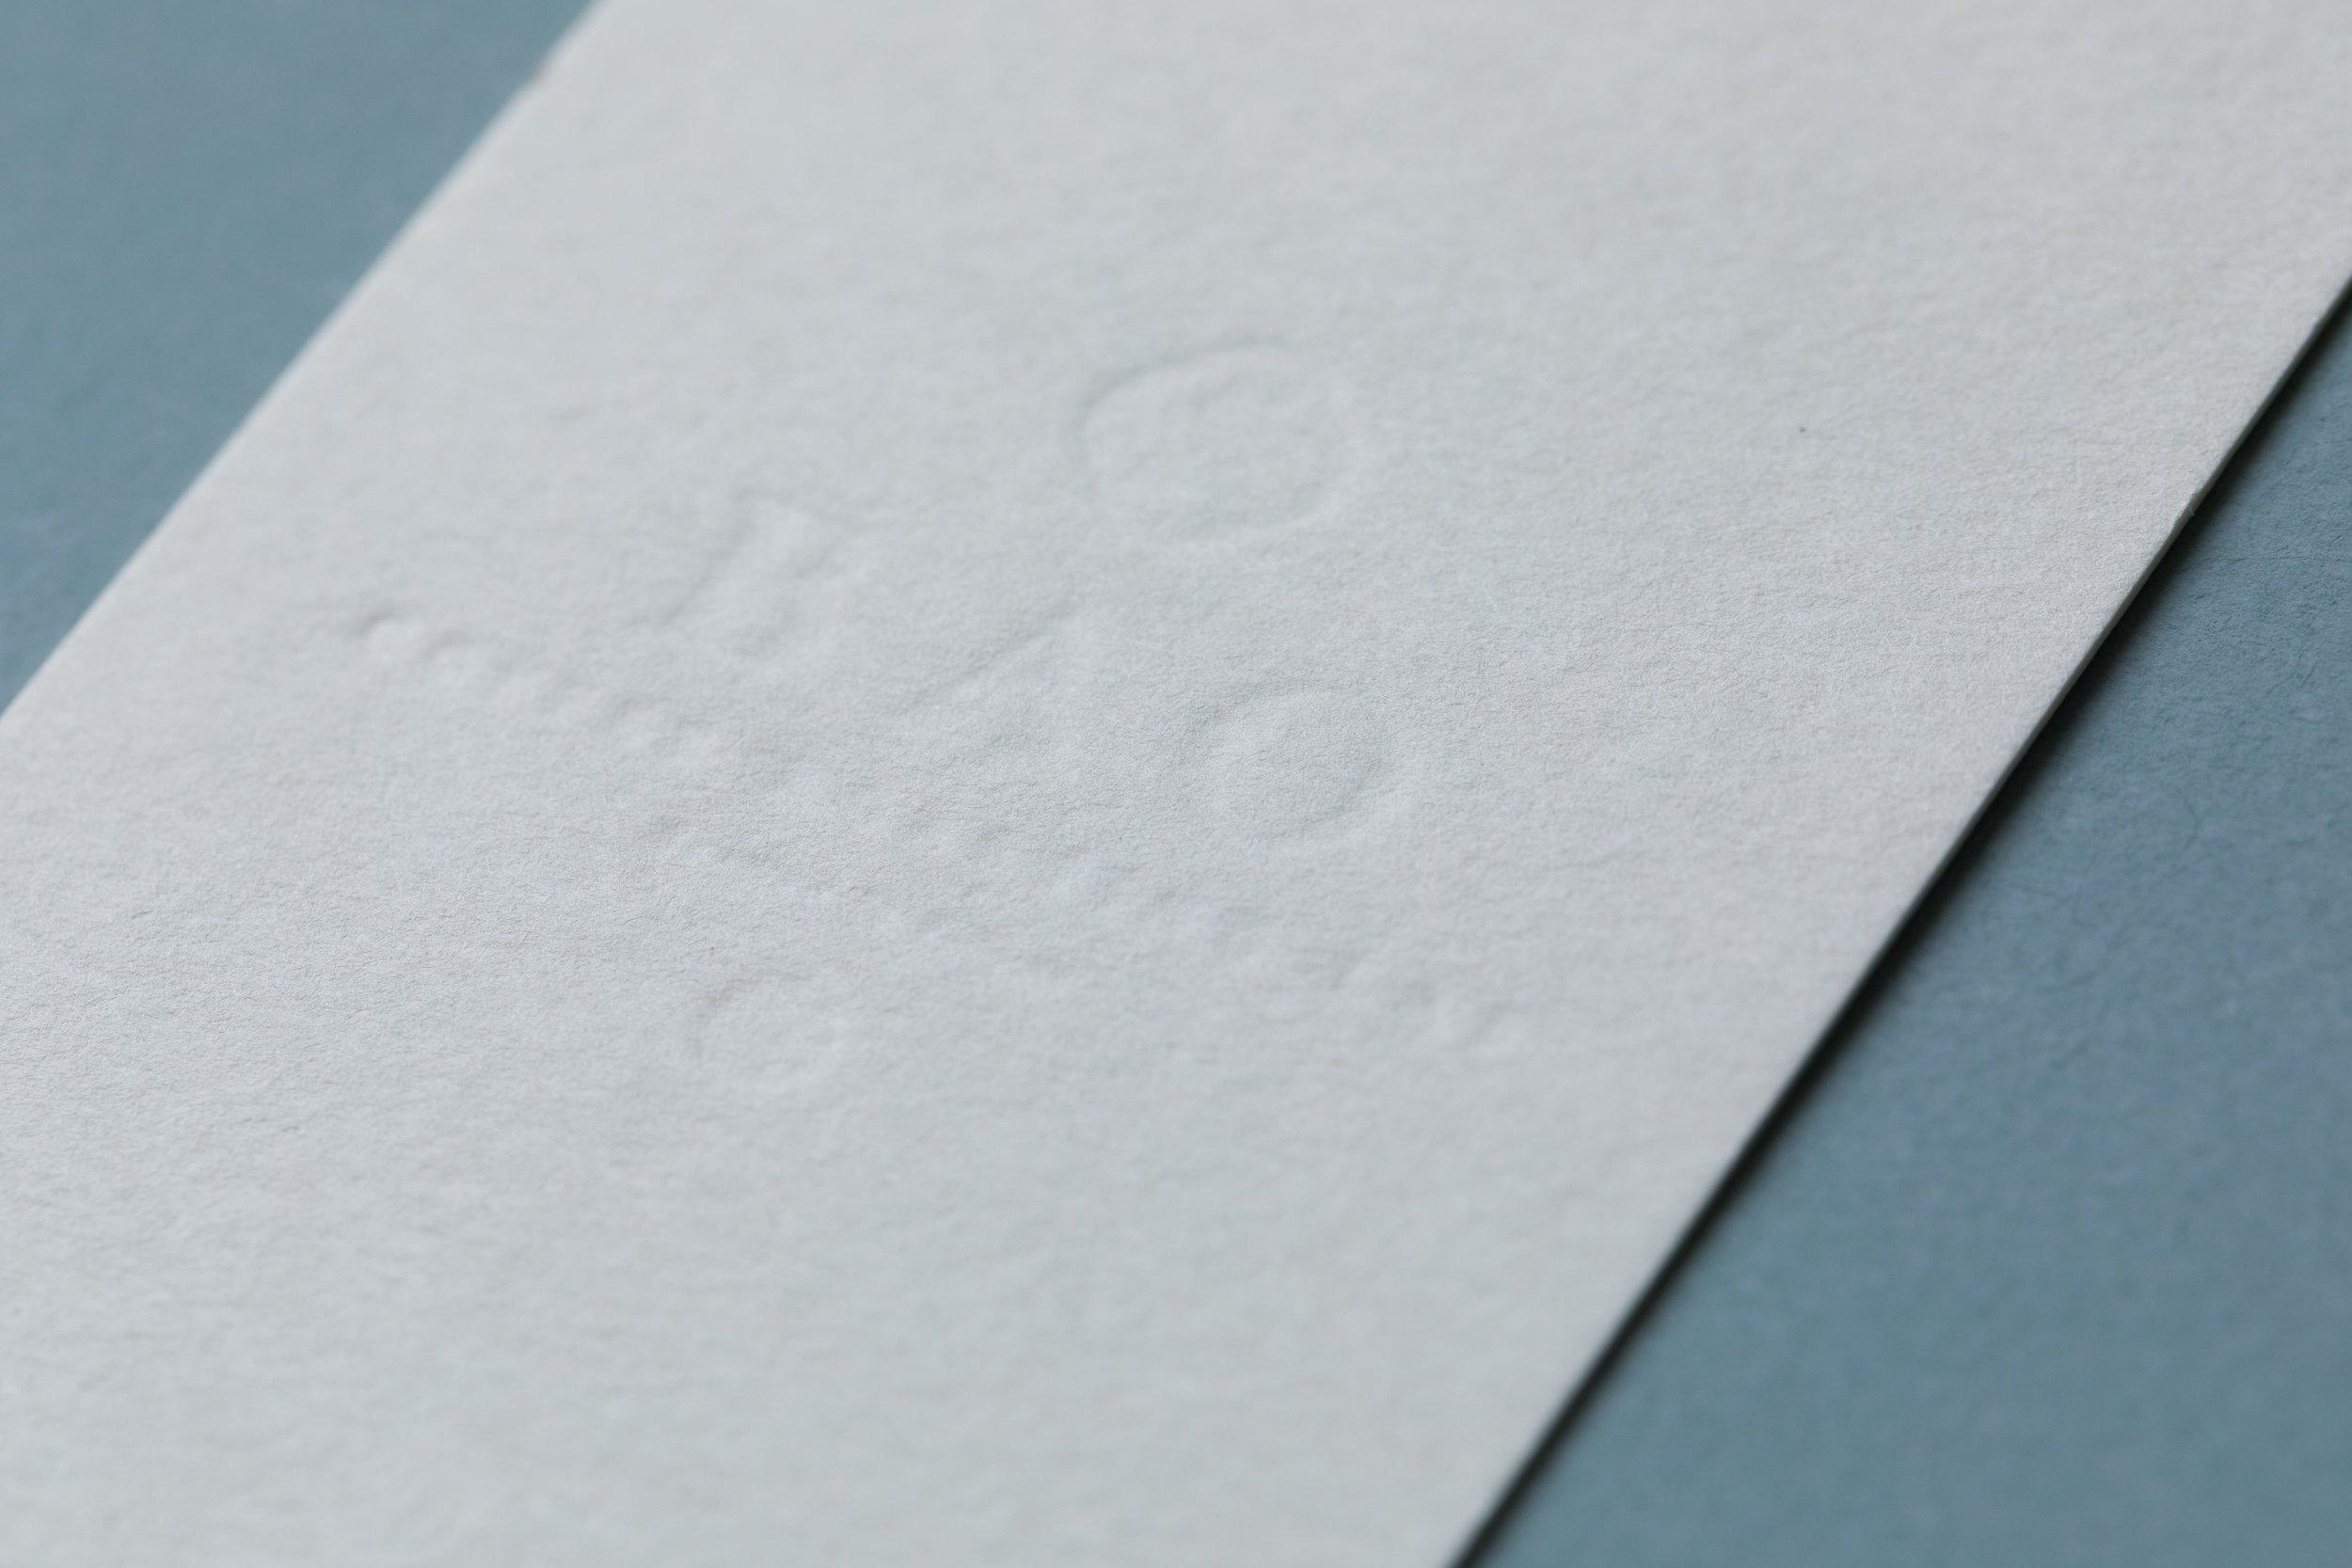 studiopros_bao card_19.jpg